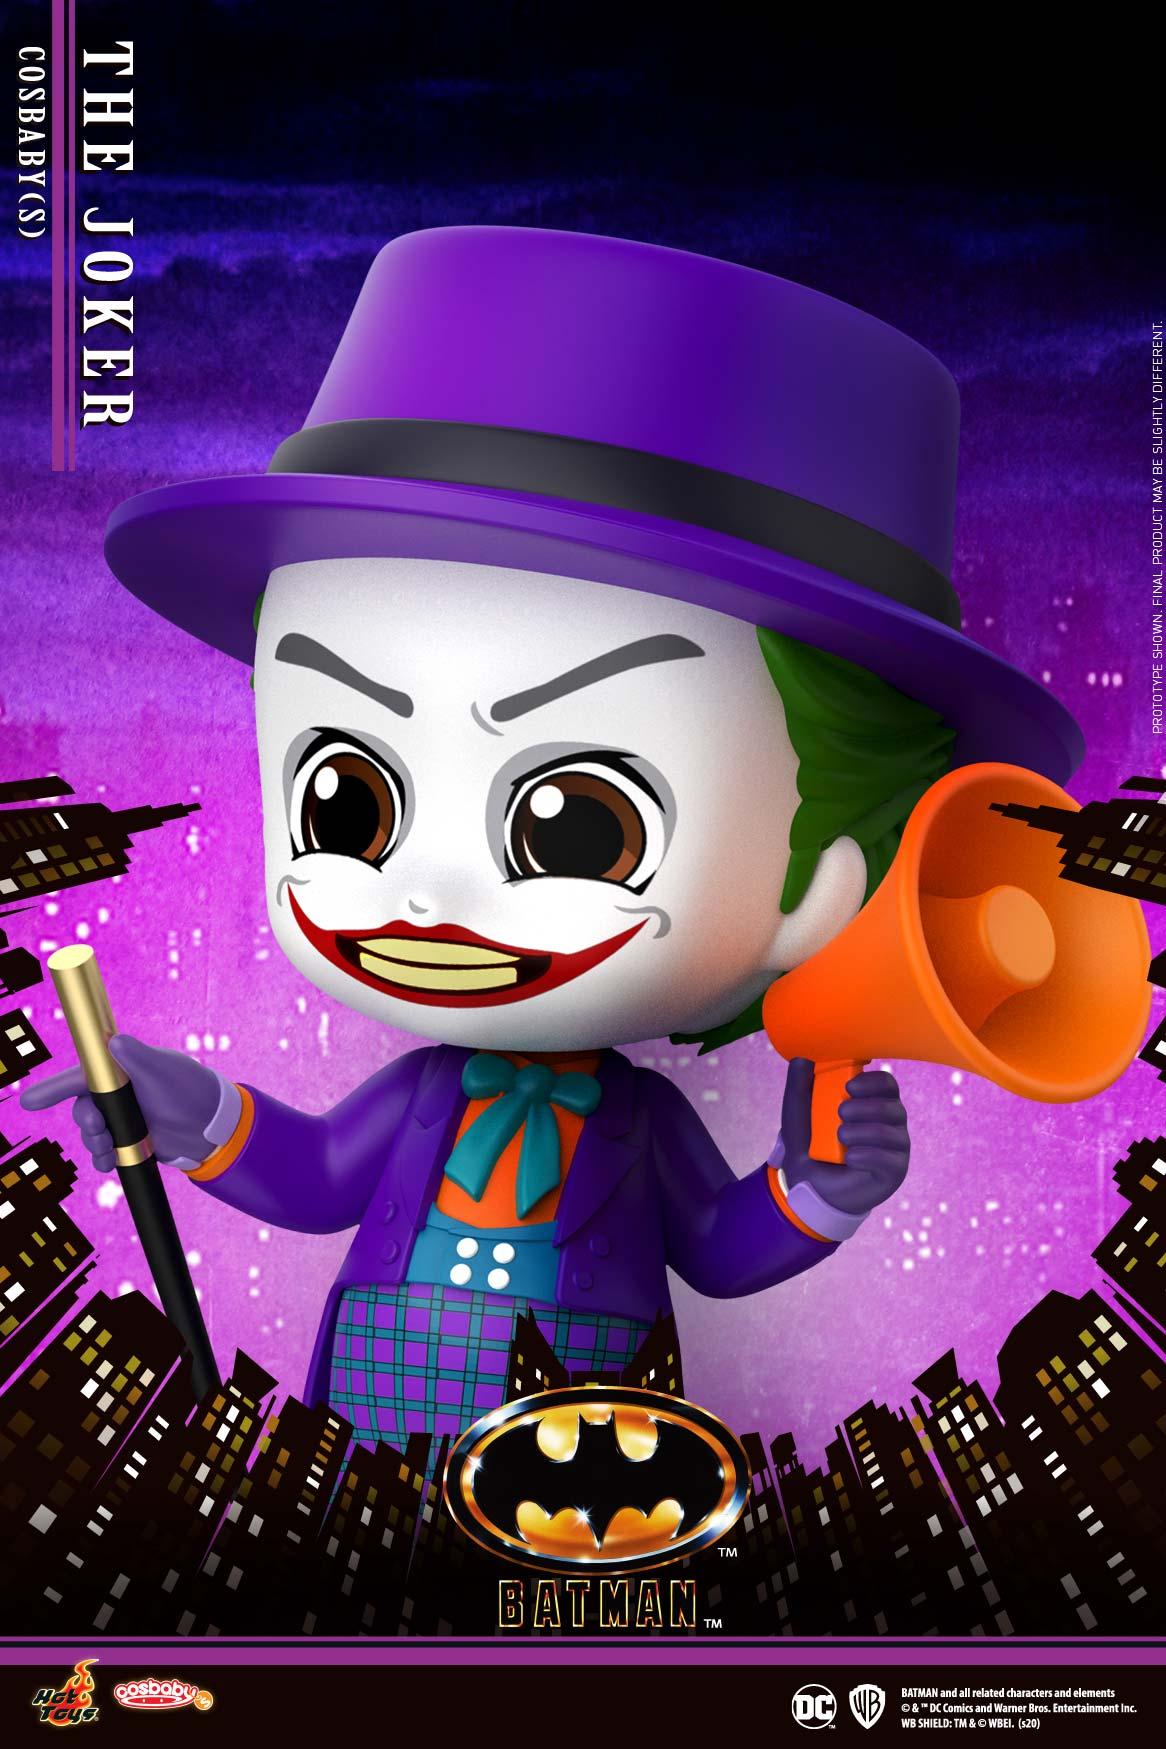 Batman-1989_COSB711_The-Joker_V02